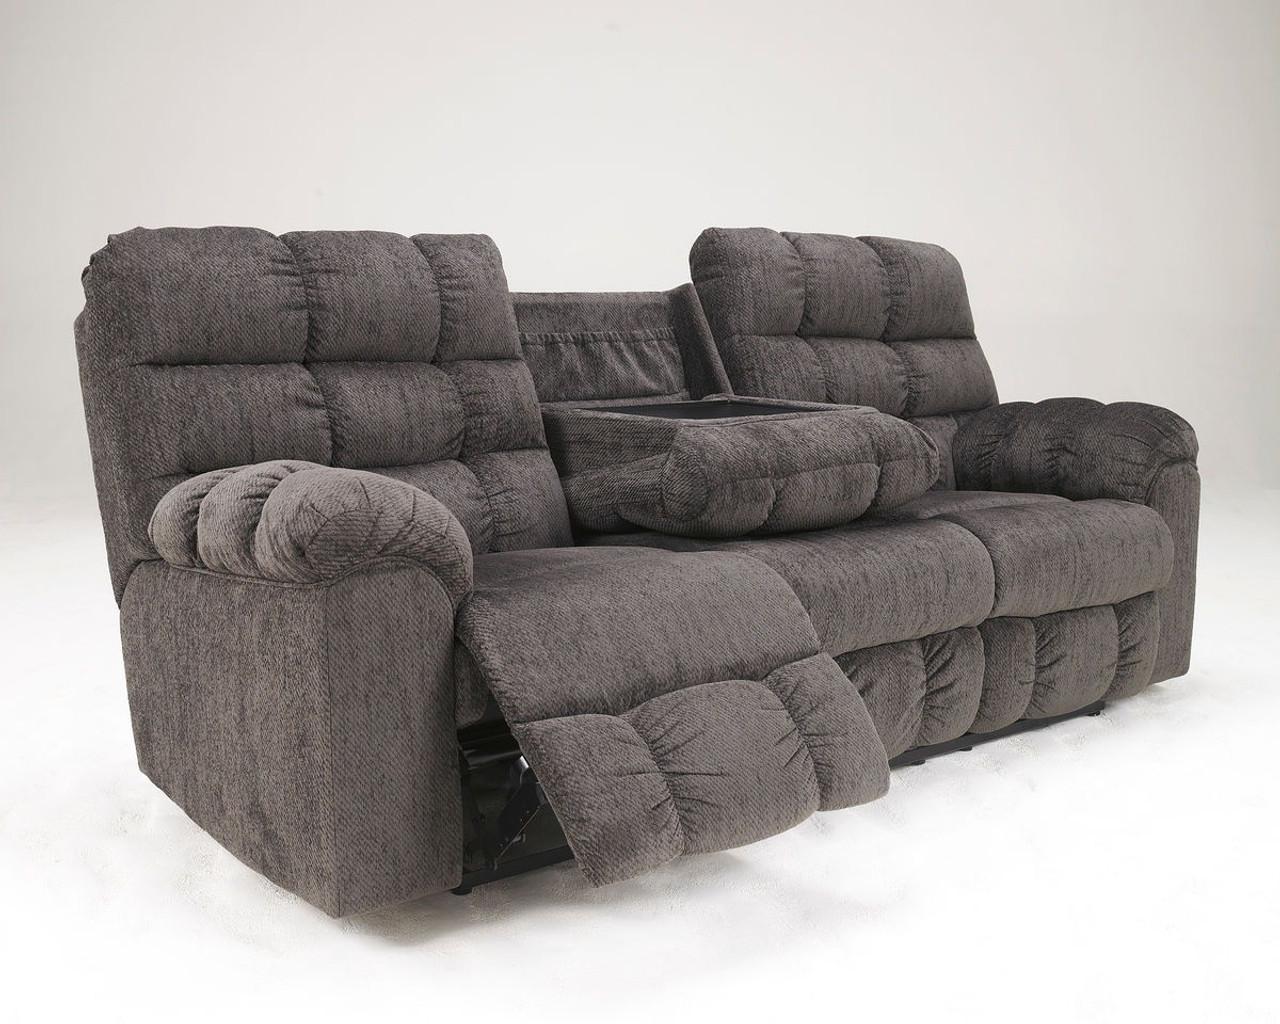 Miraculous Acieona Slate Reclining Sofa W Drop Down Table Machost Co Dining Chair Design Ideas Machostcouk